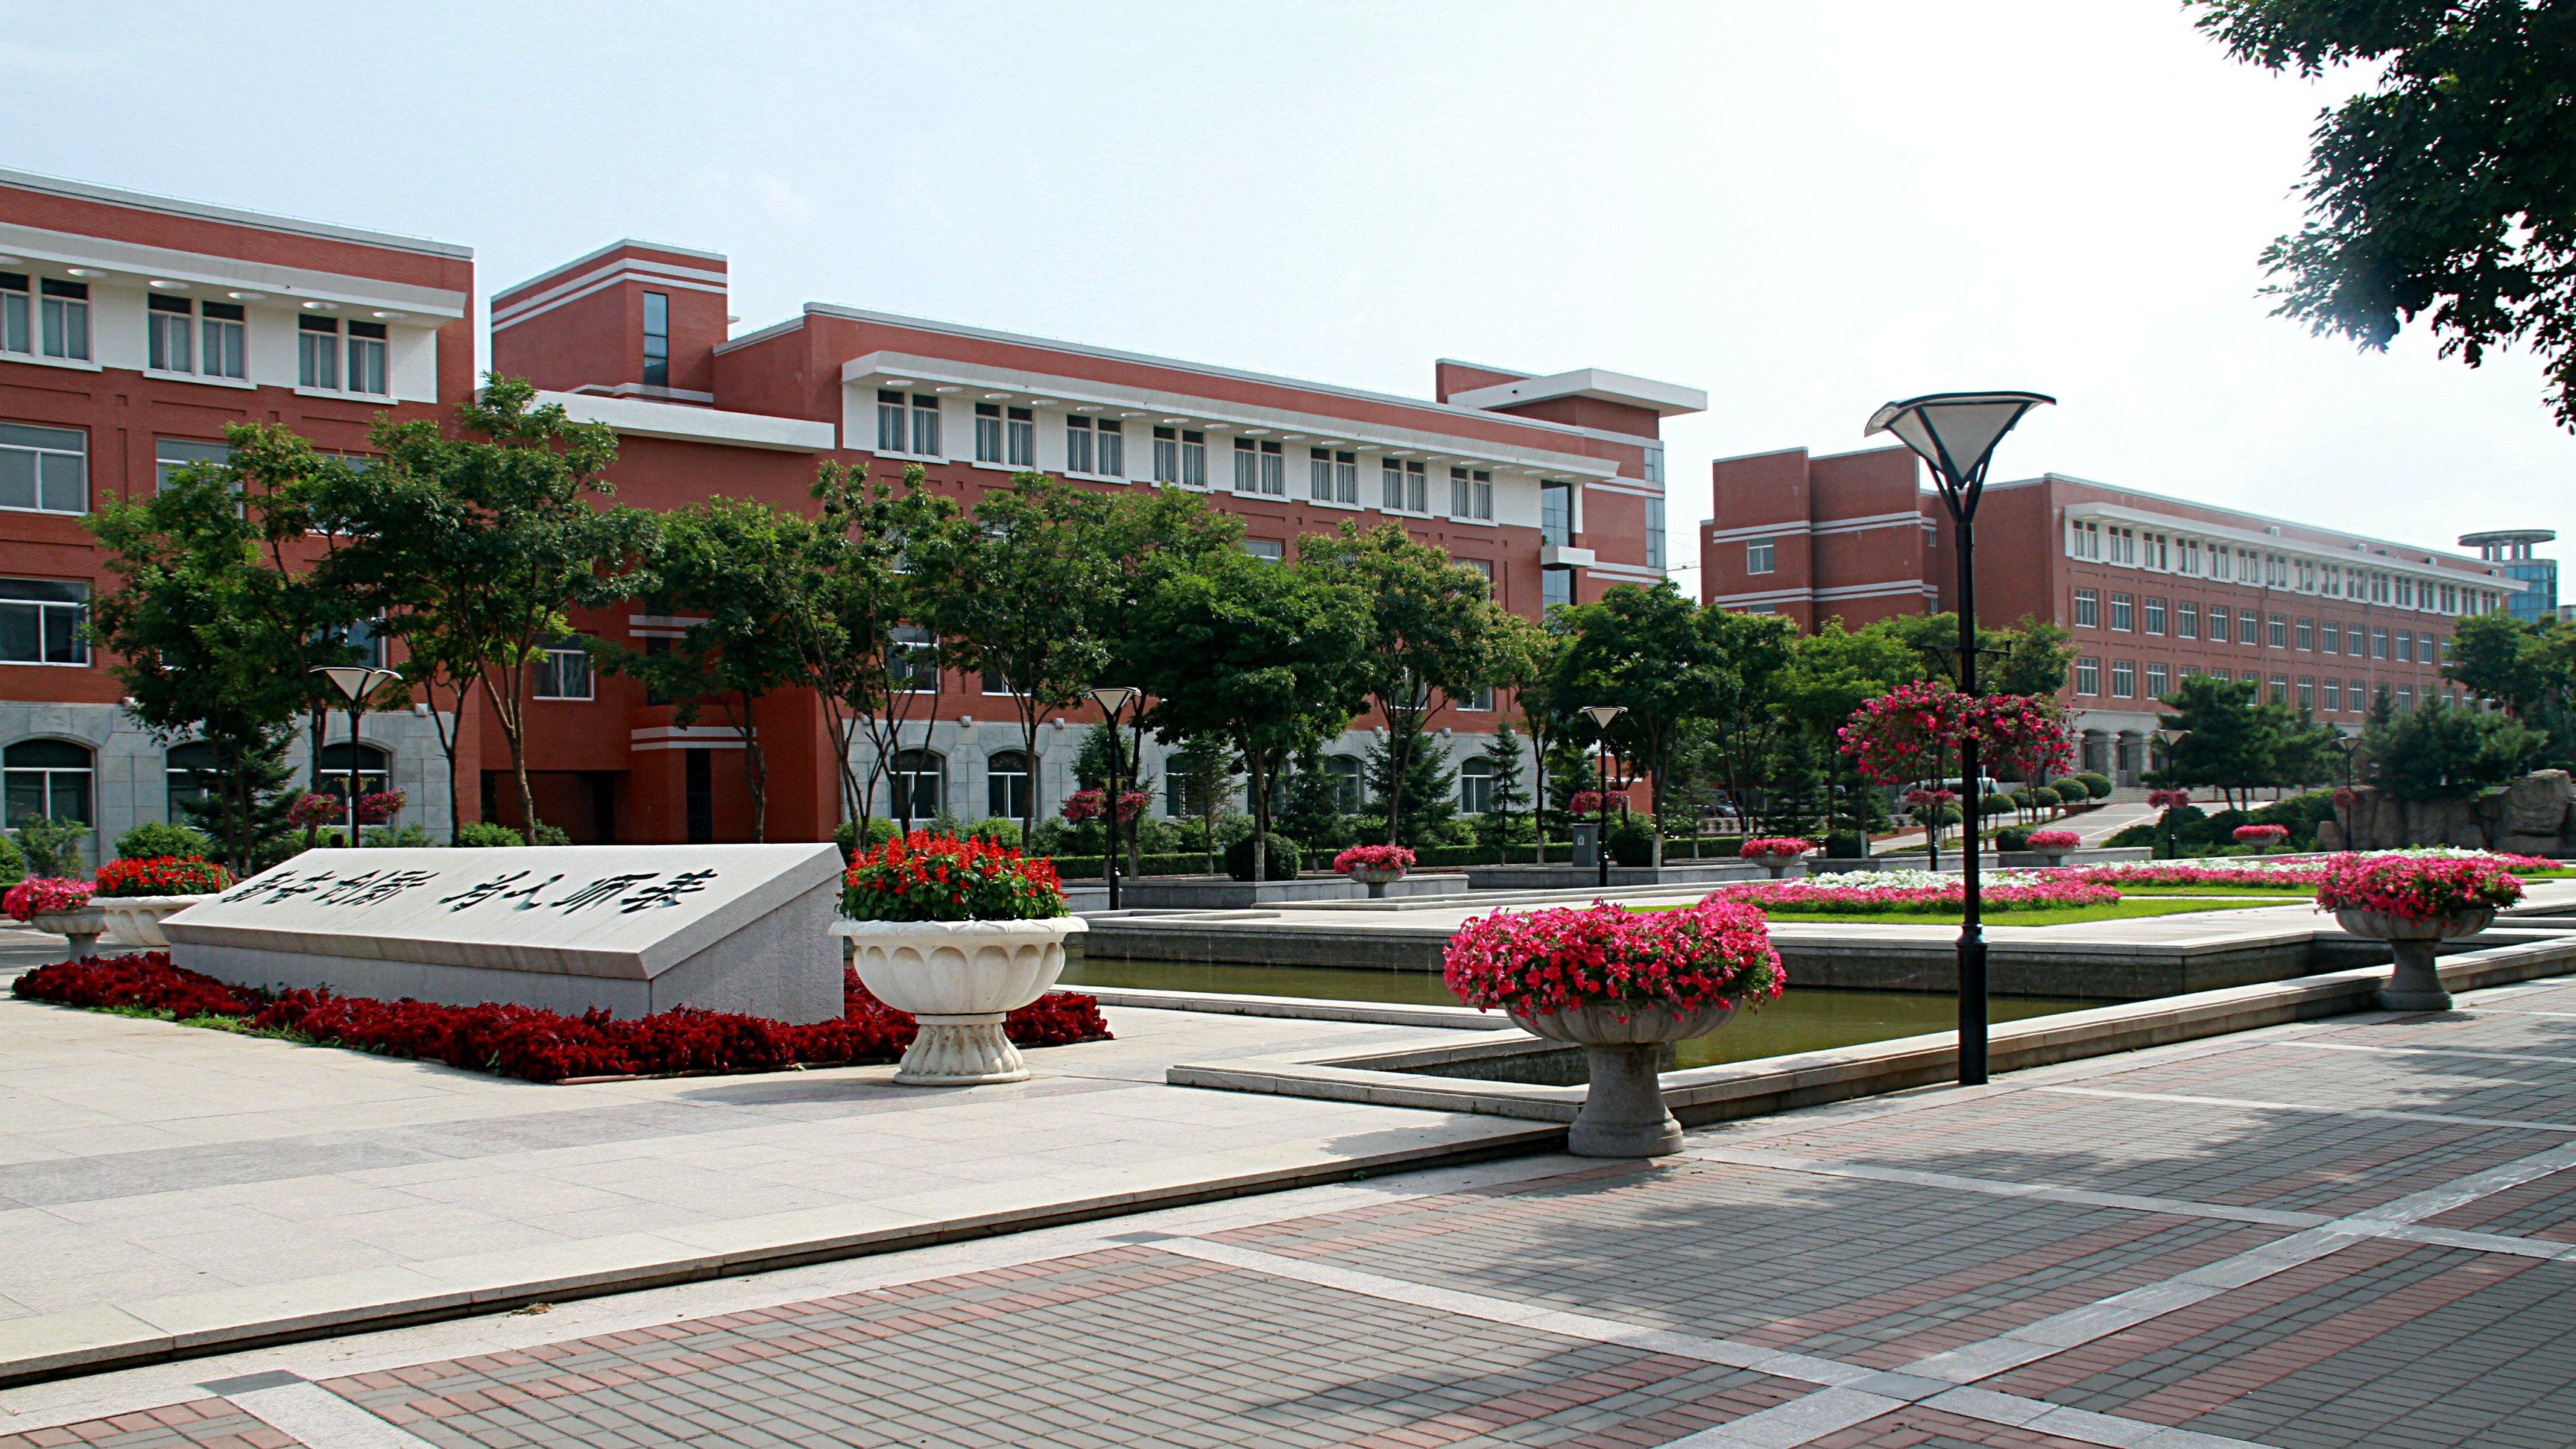 Morehead State University Morehead State University